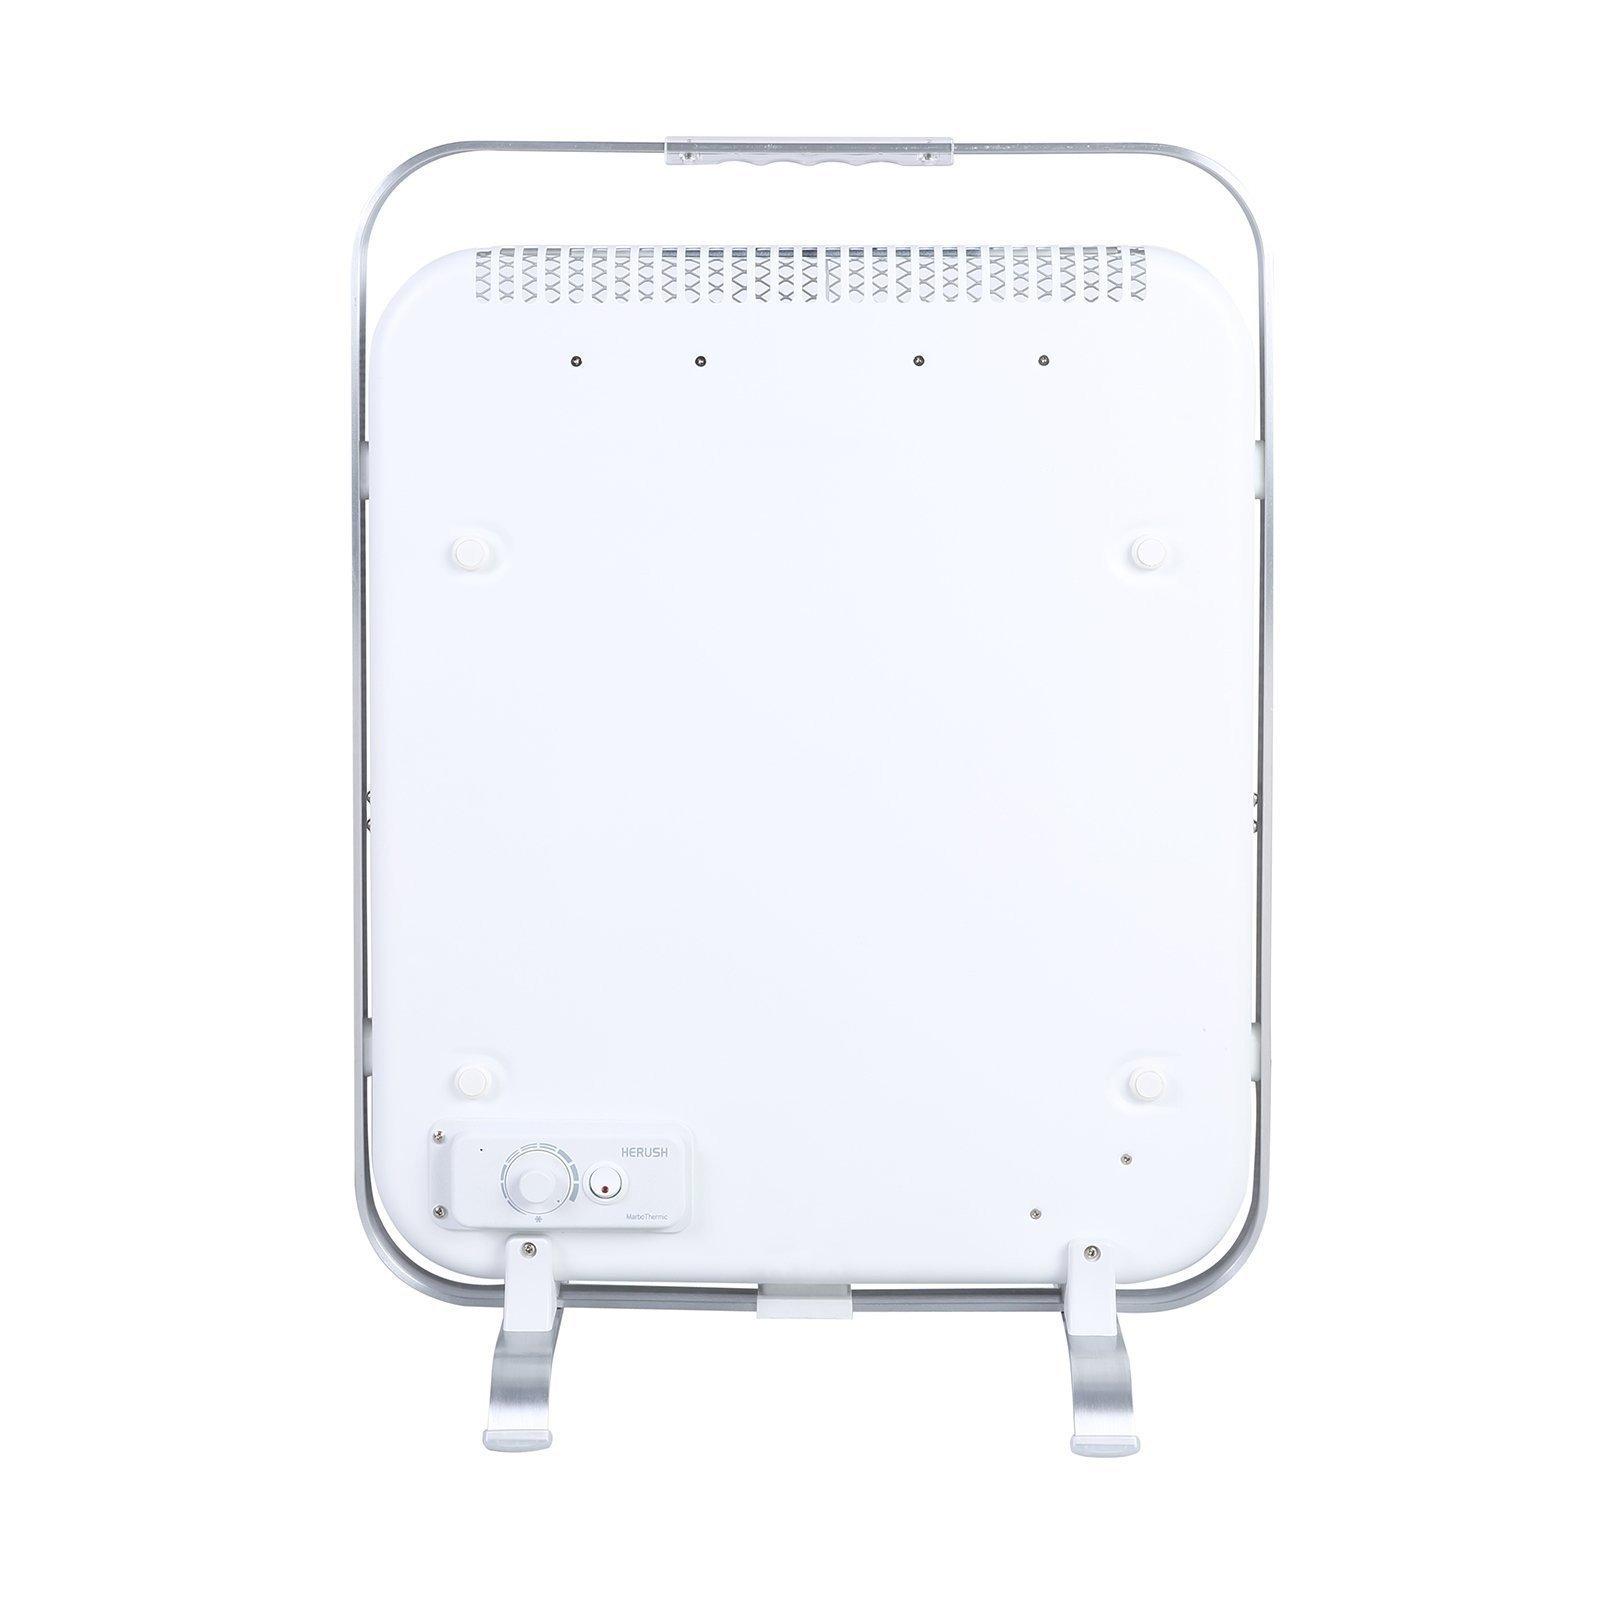 Biosari Infrared Heater Low Energy Silent Operation